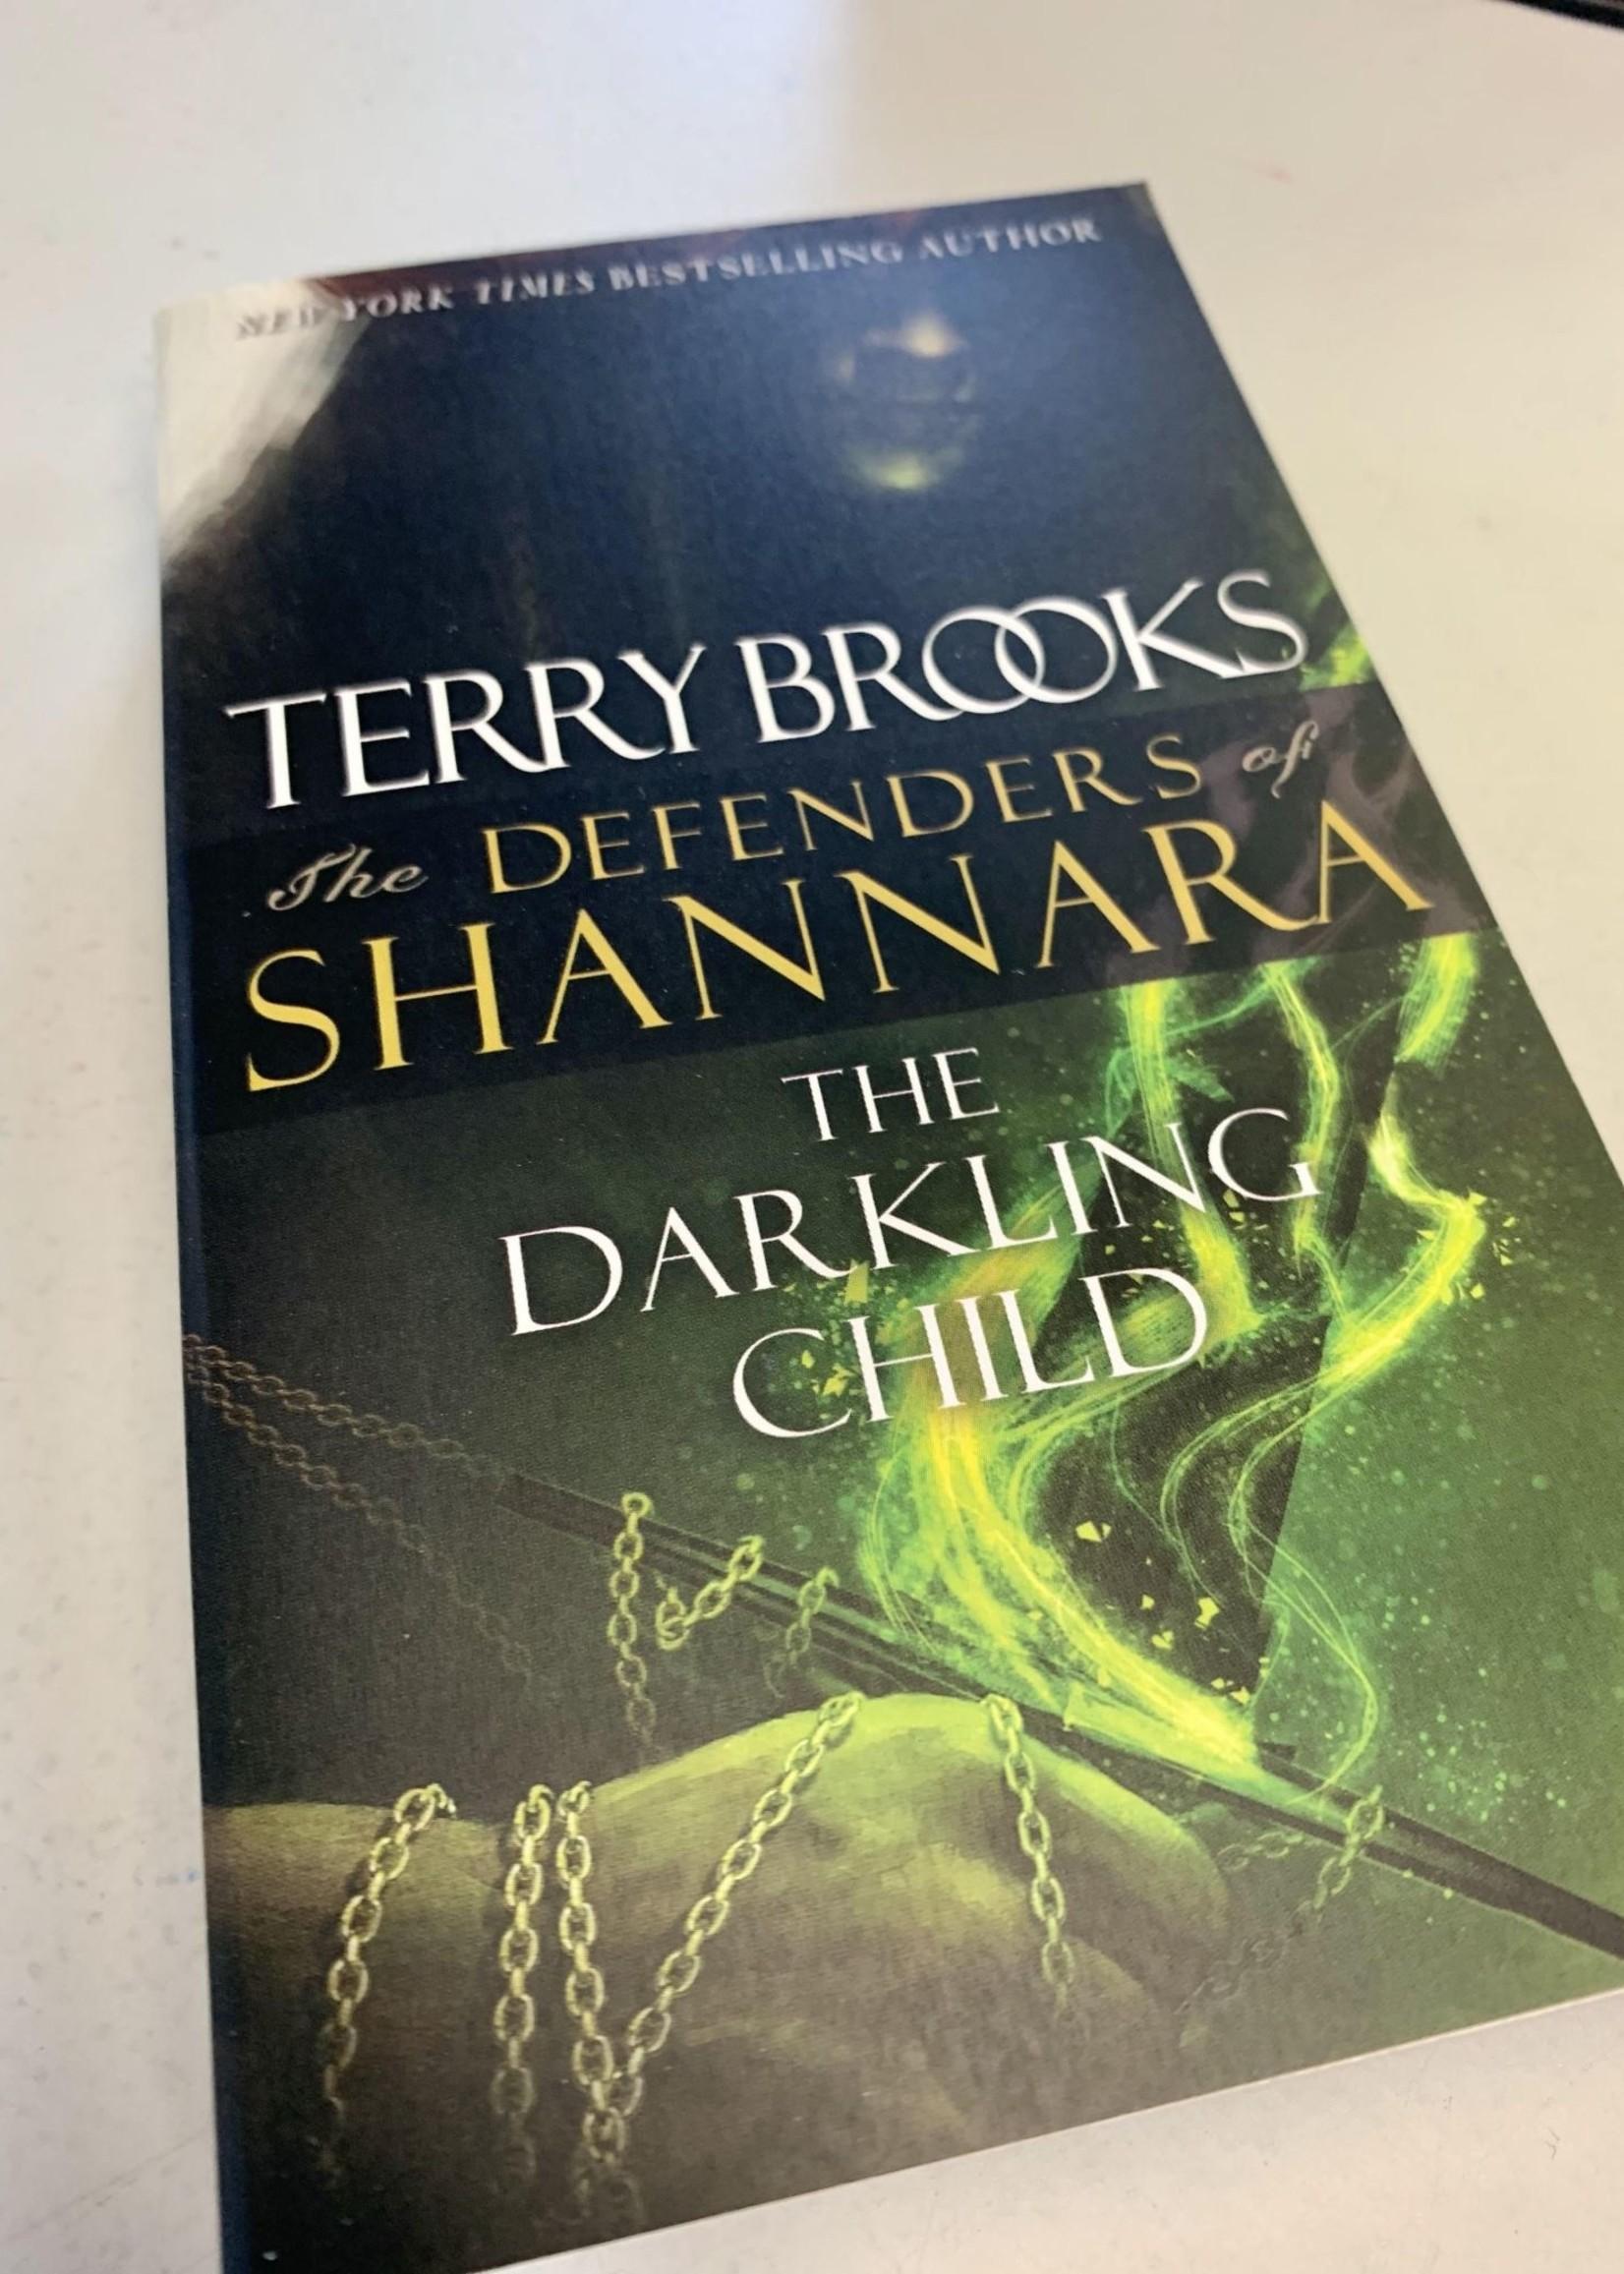 The Darkling Child - Terry Brooks